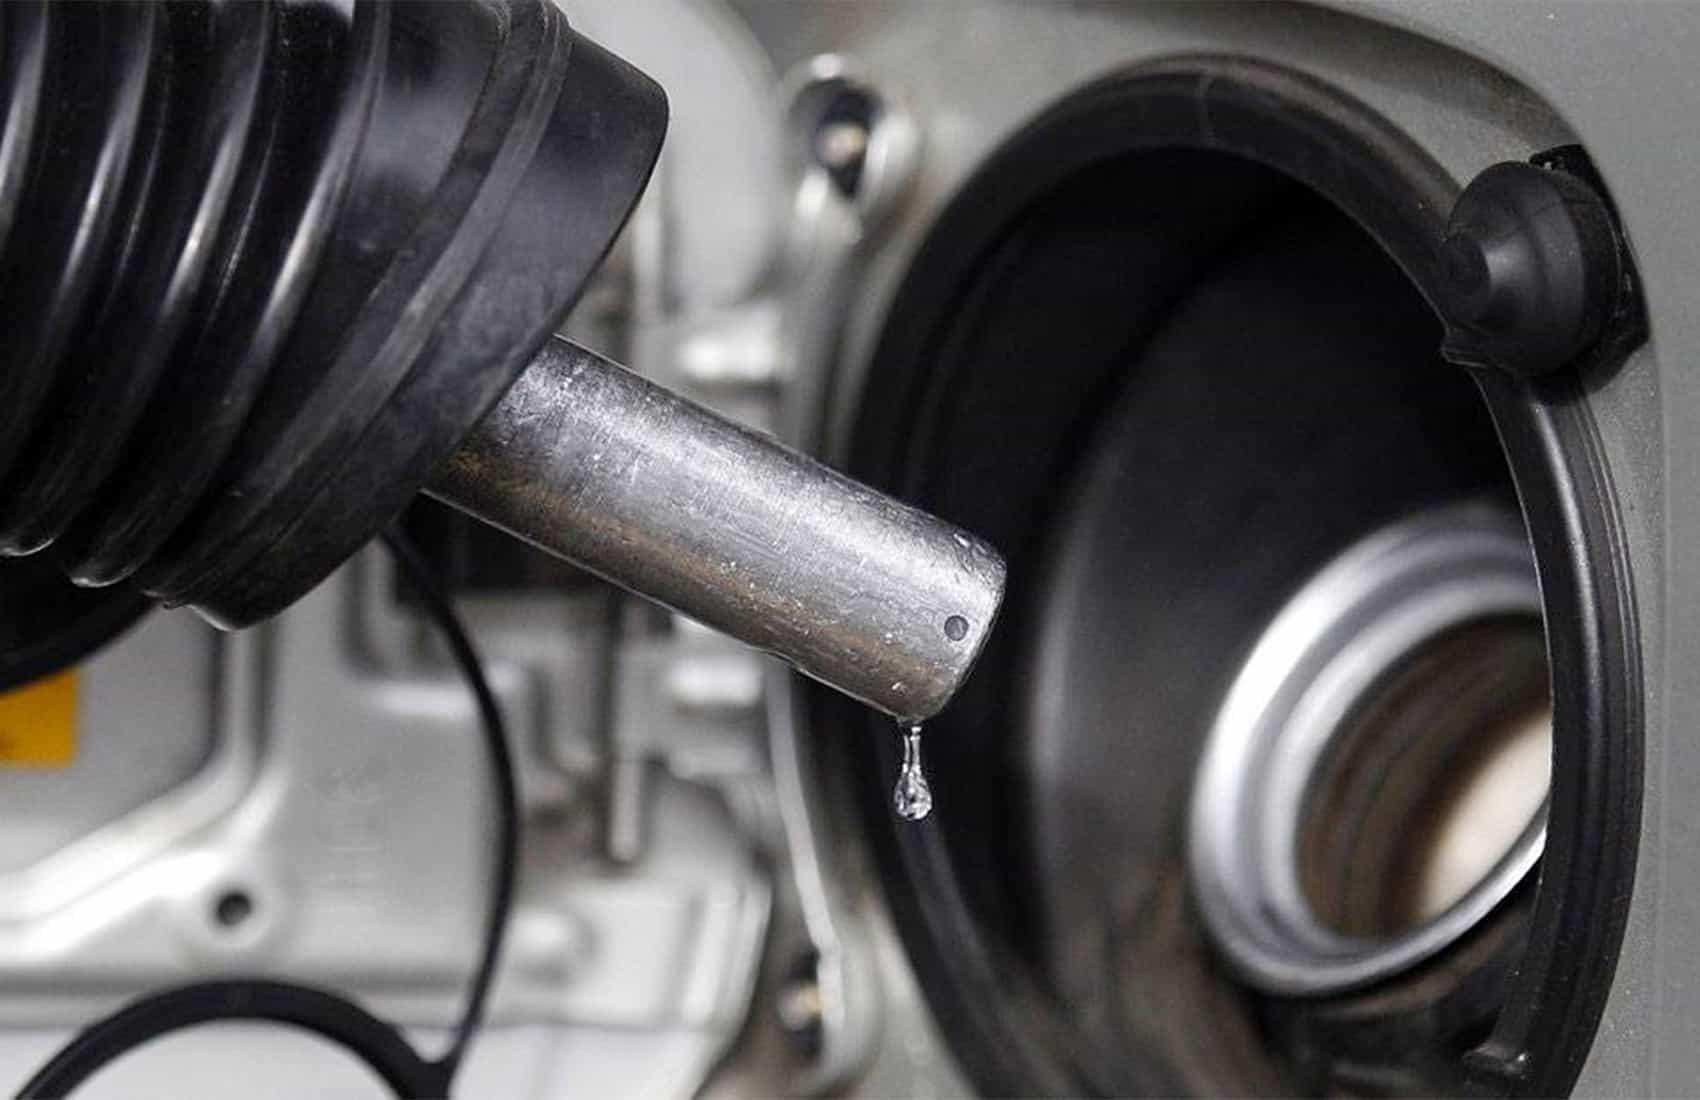 Fuel prices, gas pump